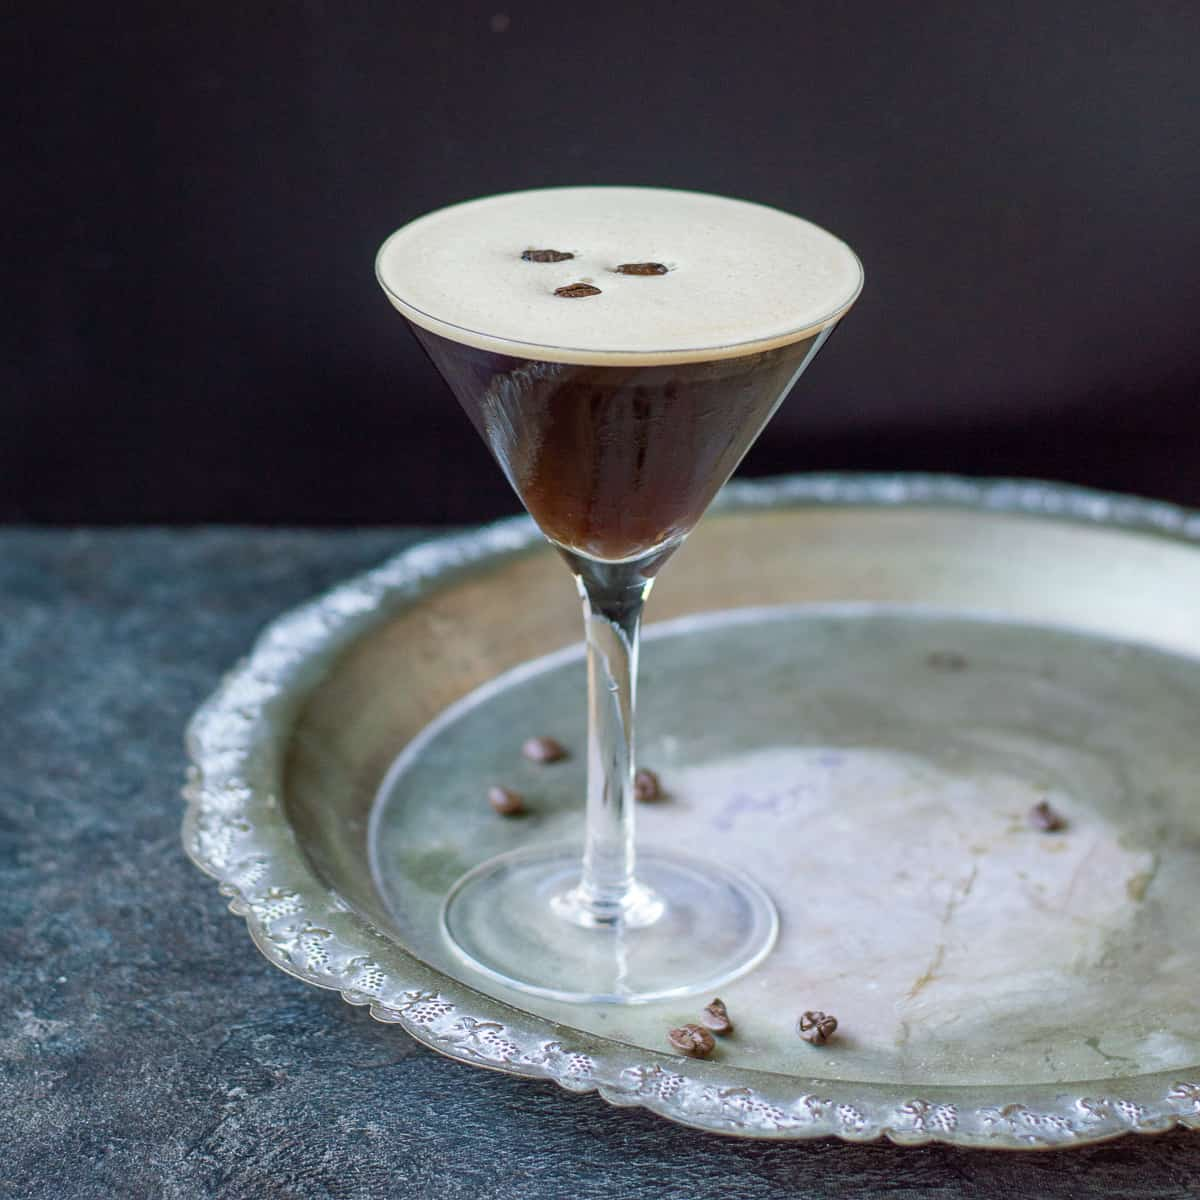 Espresso Martini with coffee beans